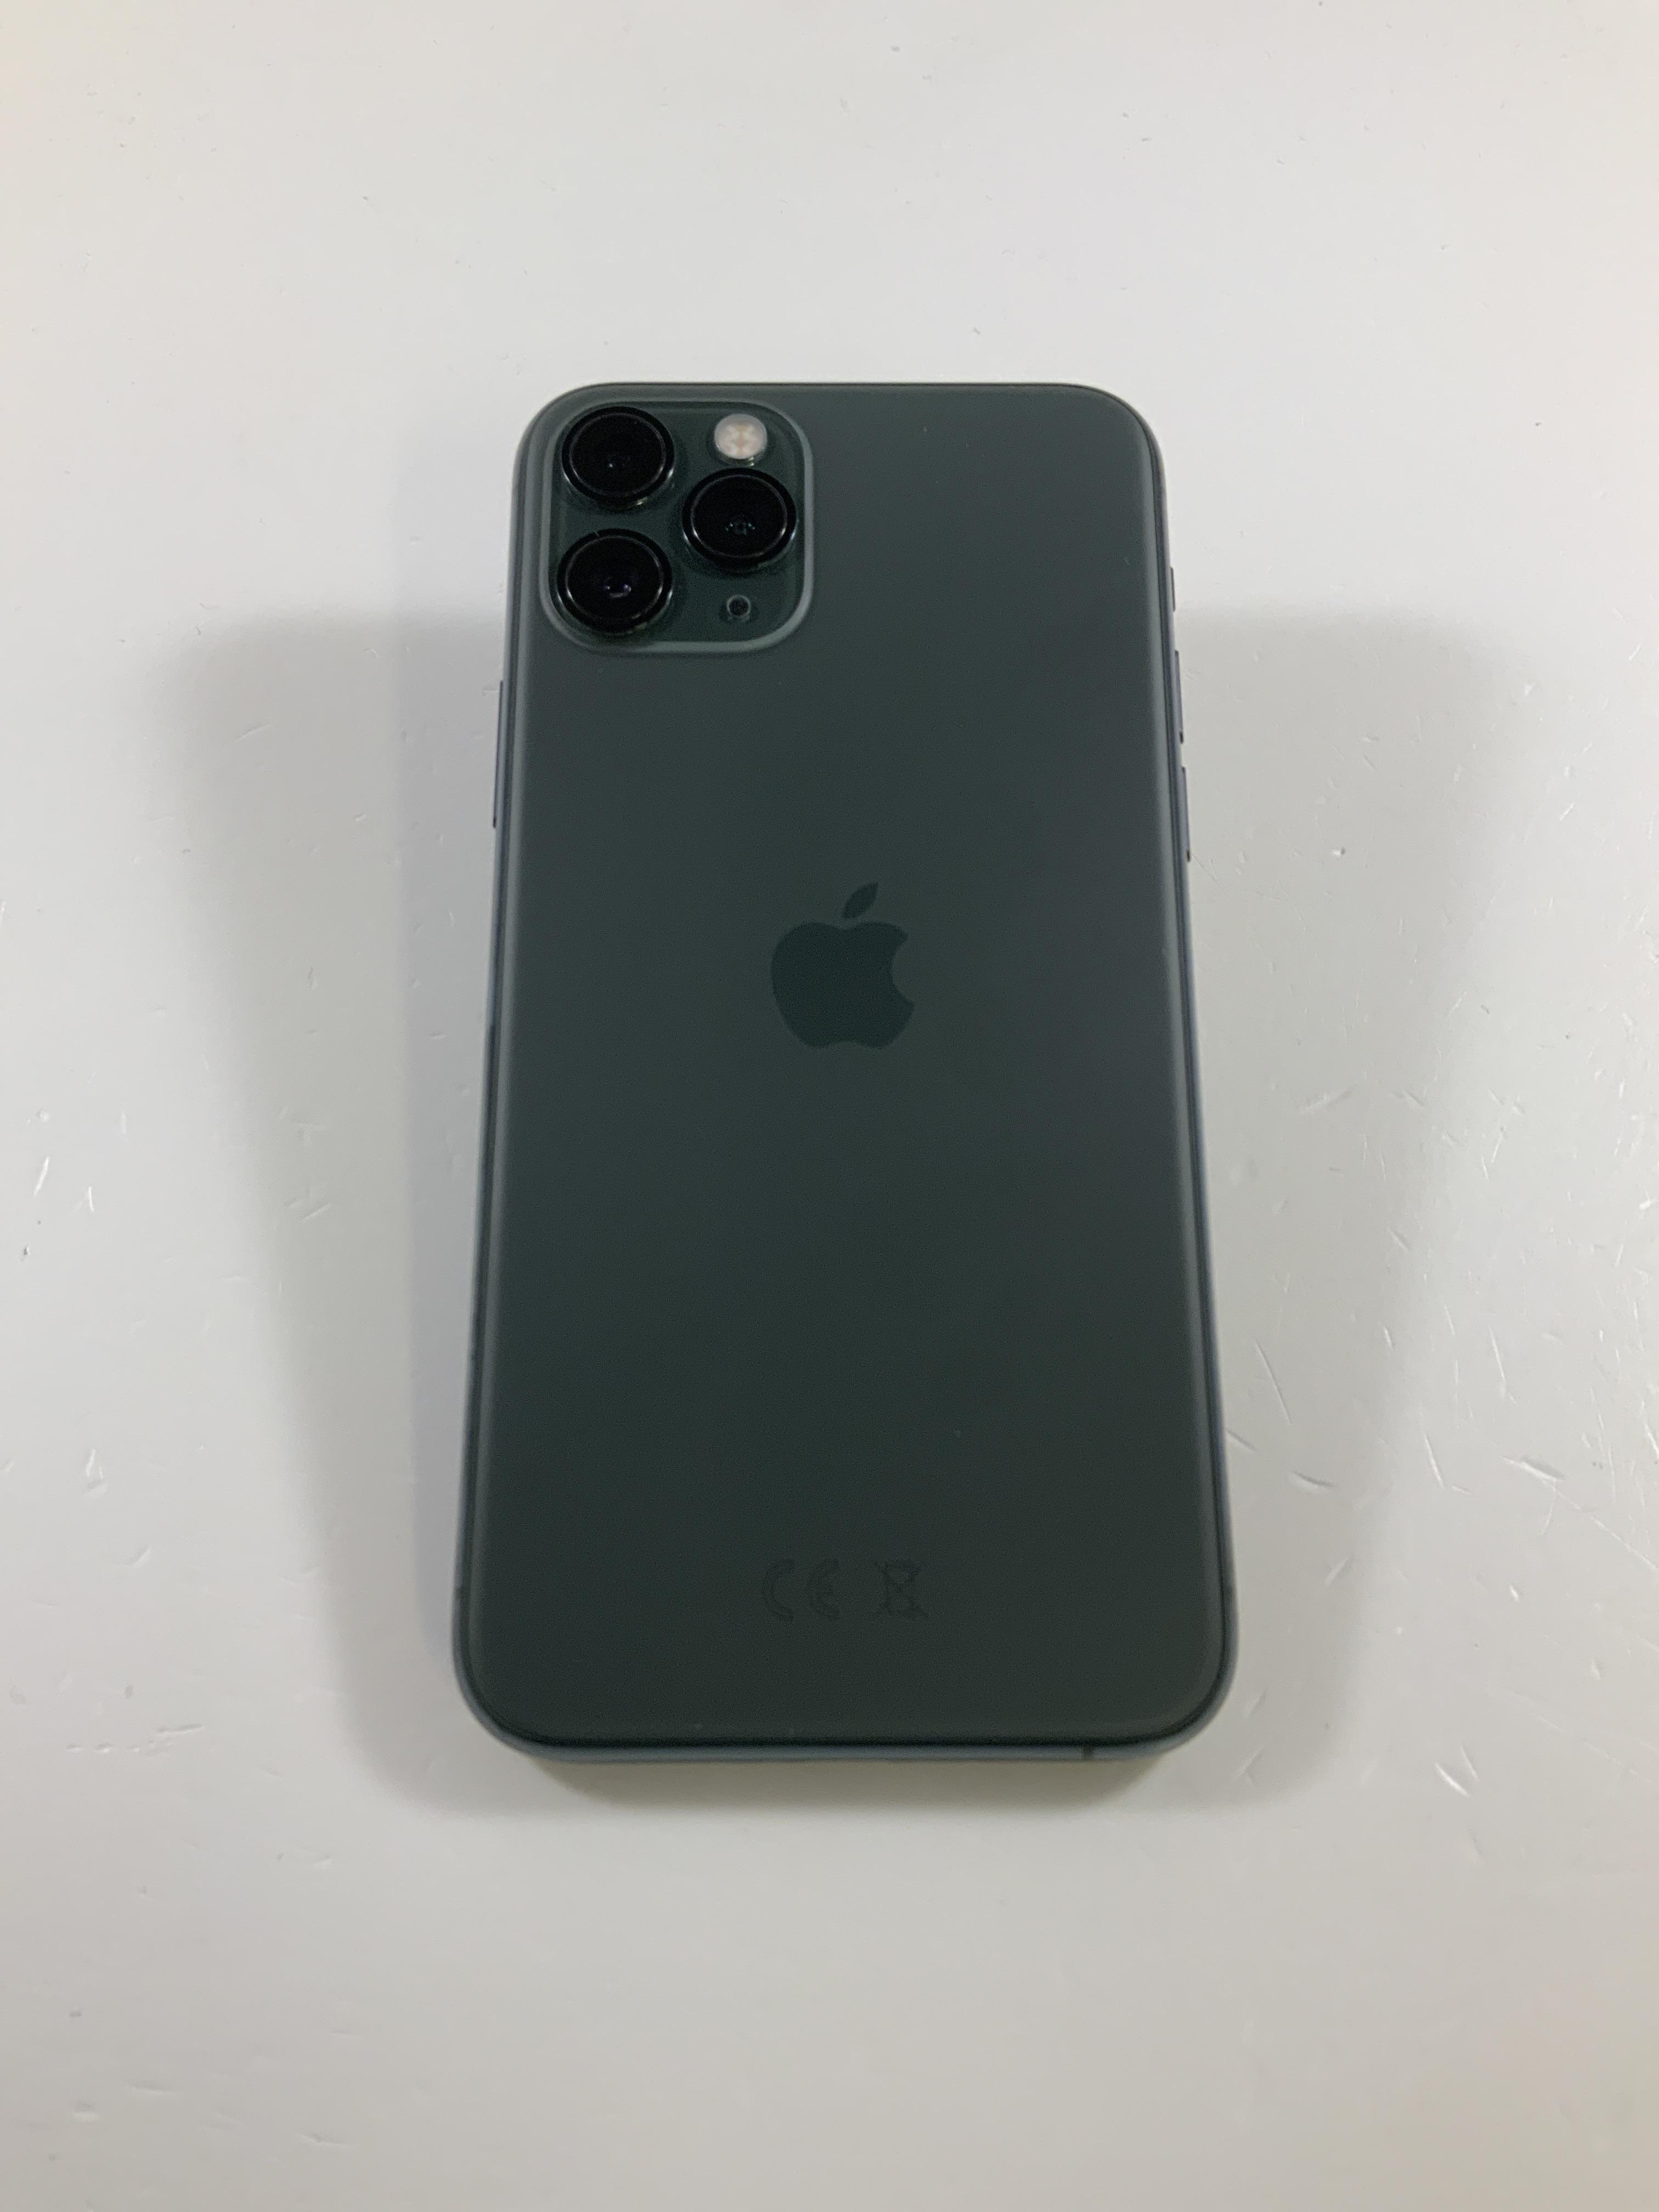 iPhone 11 Pro 64GB, 64GB, Midnight Green, Afbeelding 2